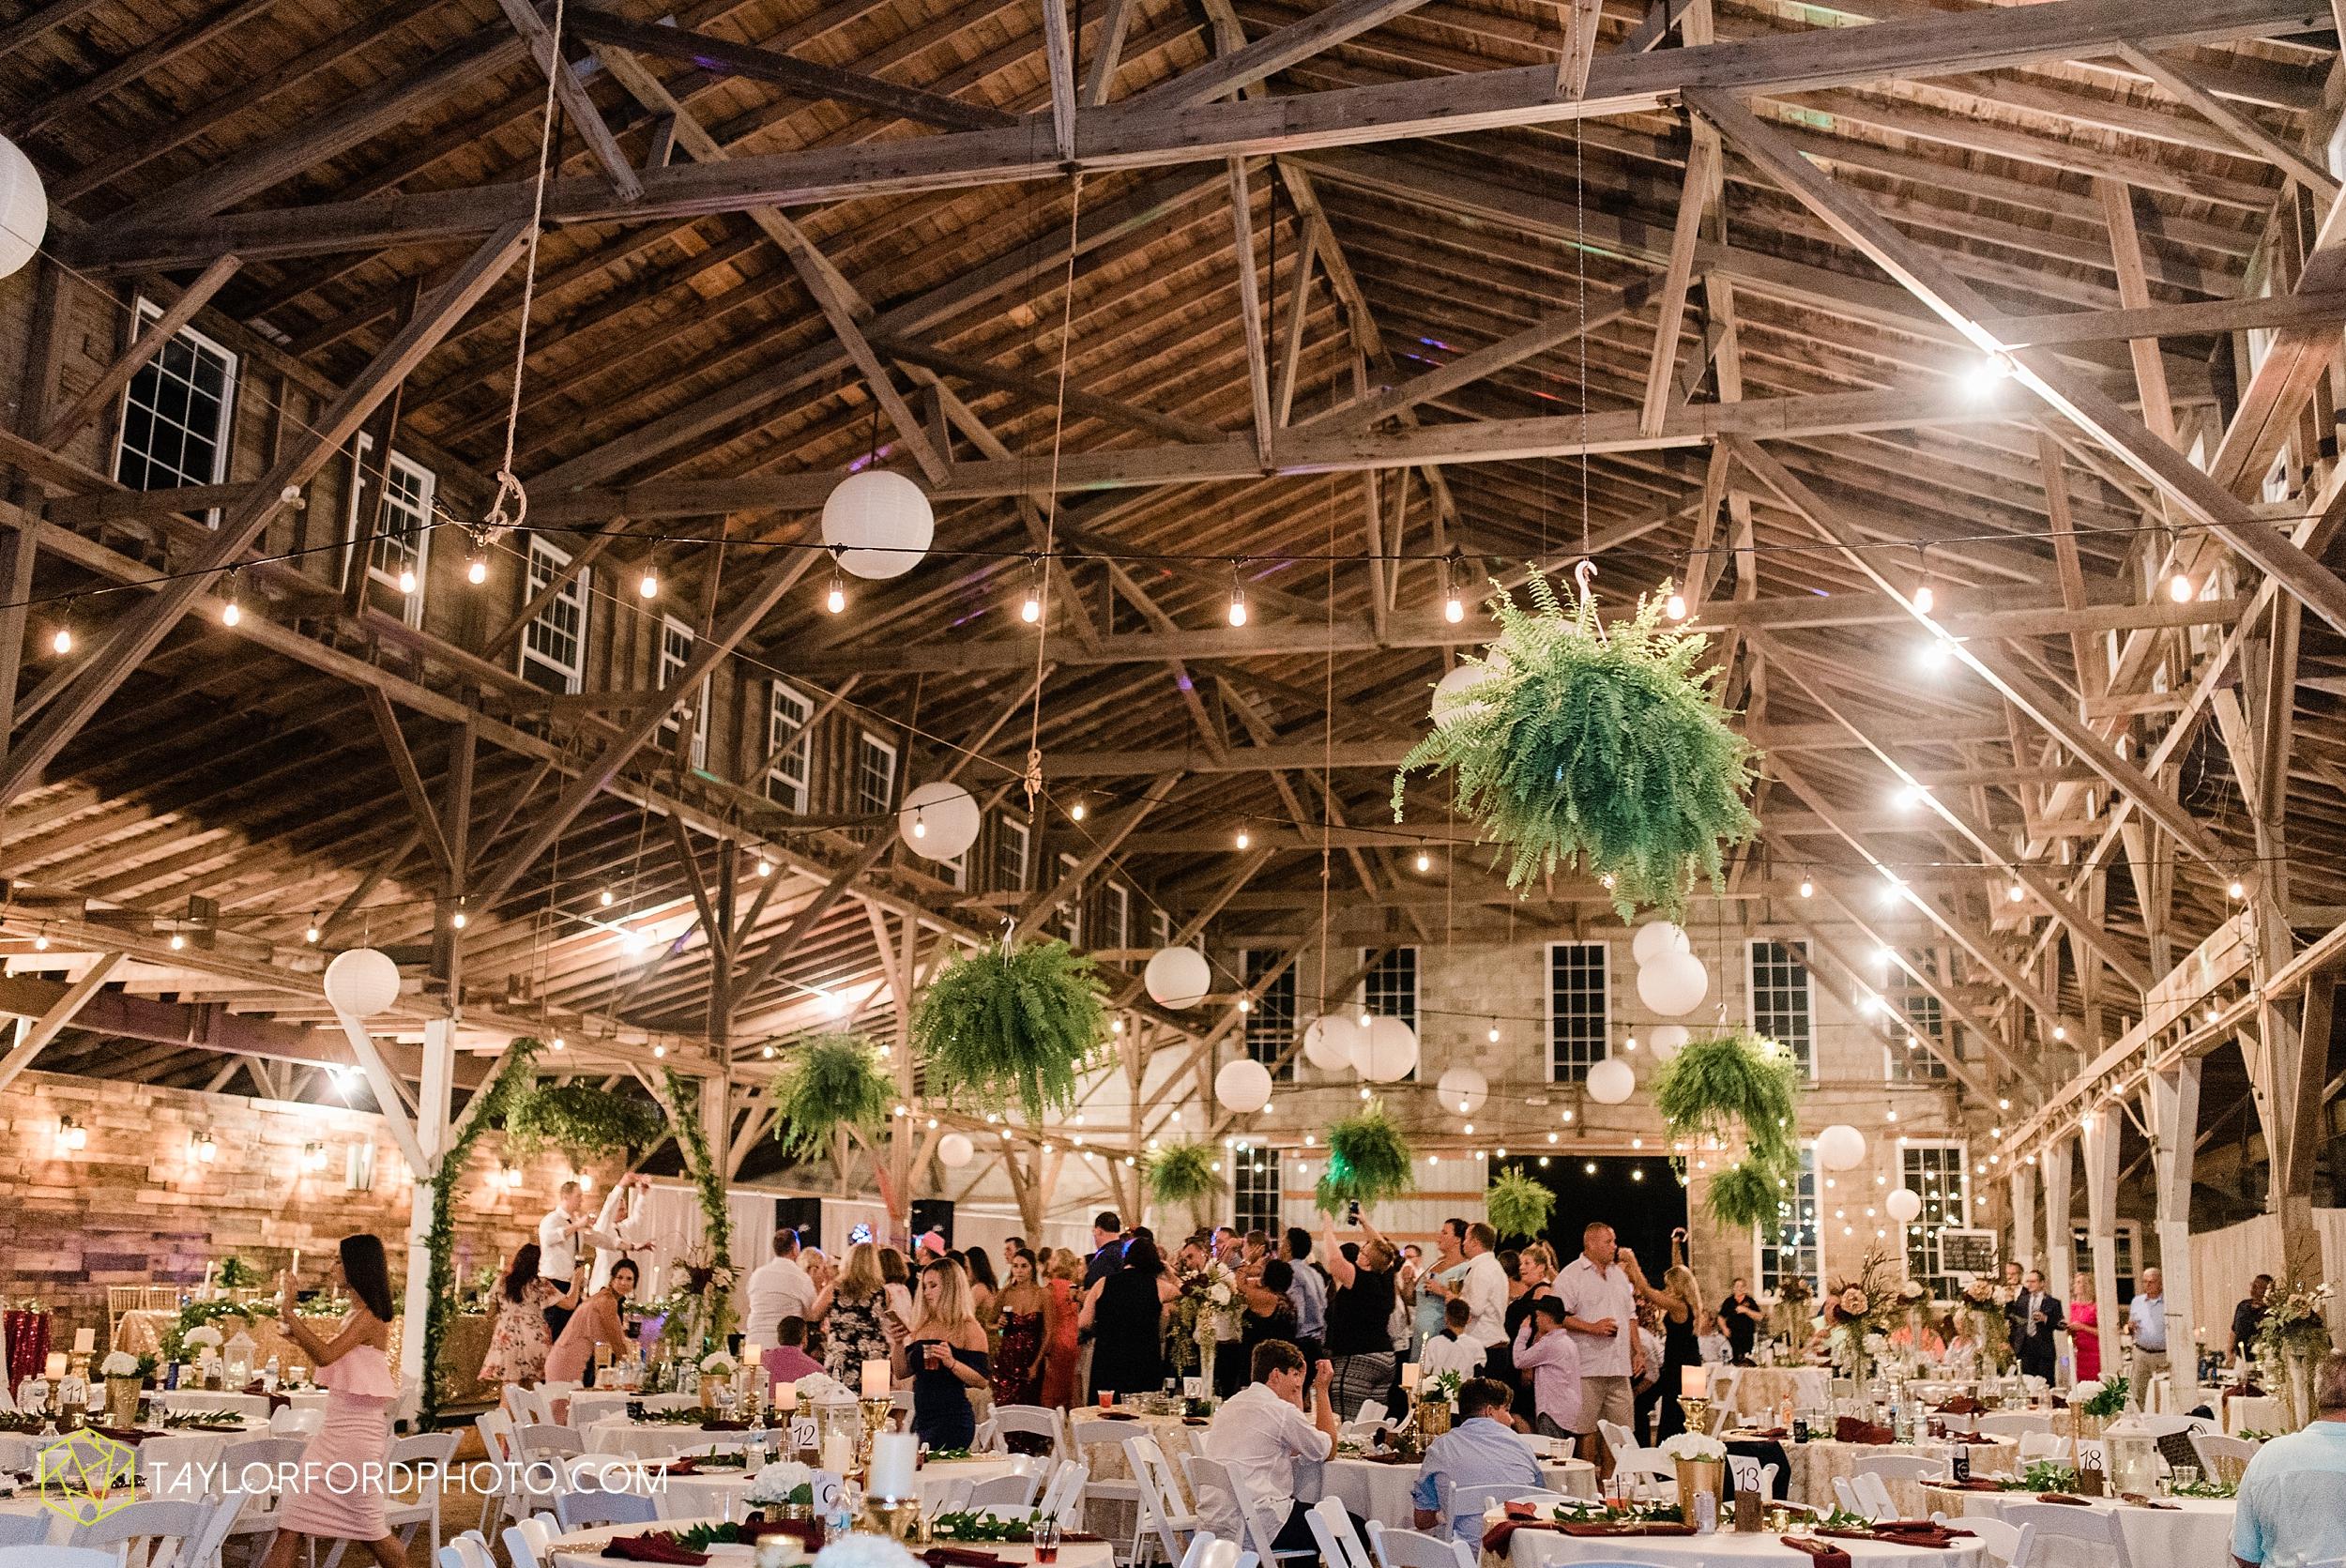 van-wert-ohio-first-united-methodist-church-county-dairy-barn-wedding-photographer-taylor-ford-photography_9892.jpg